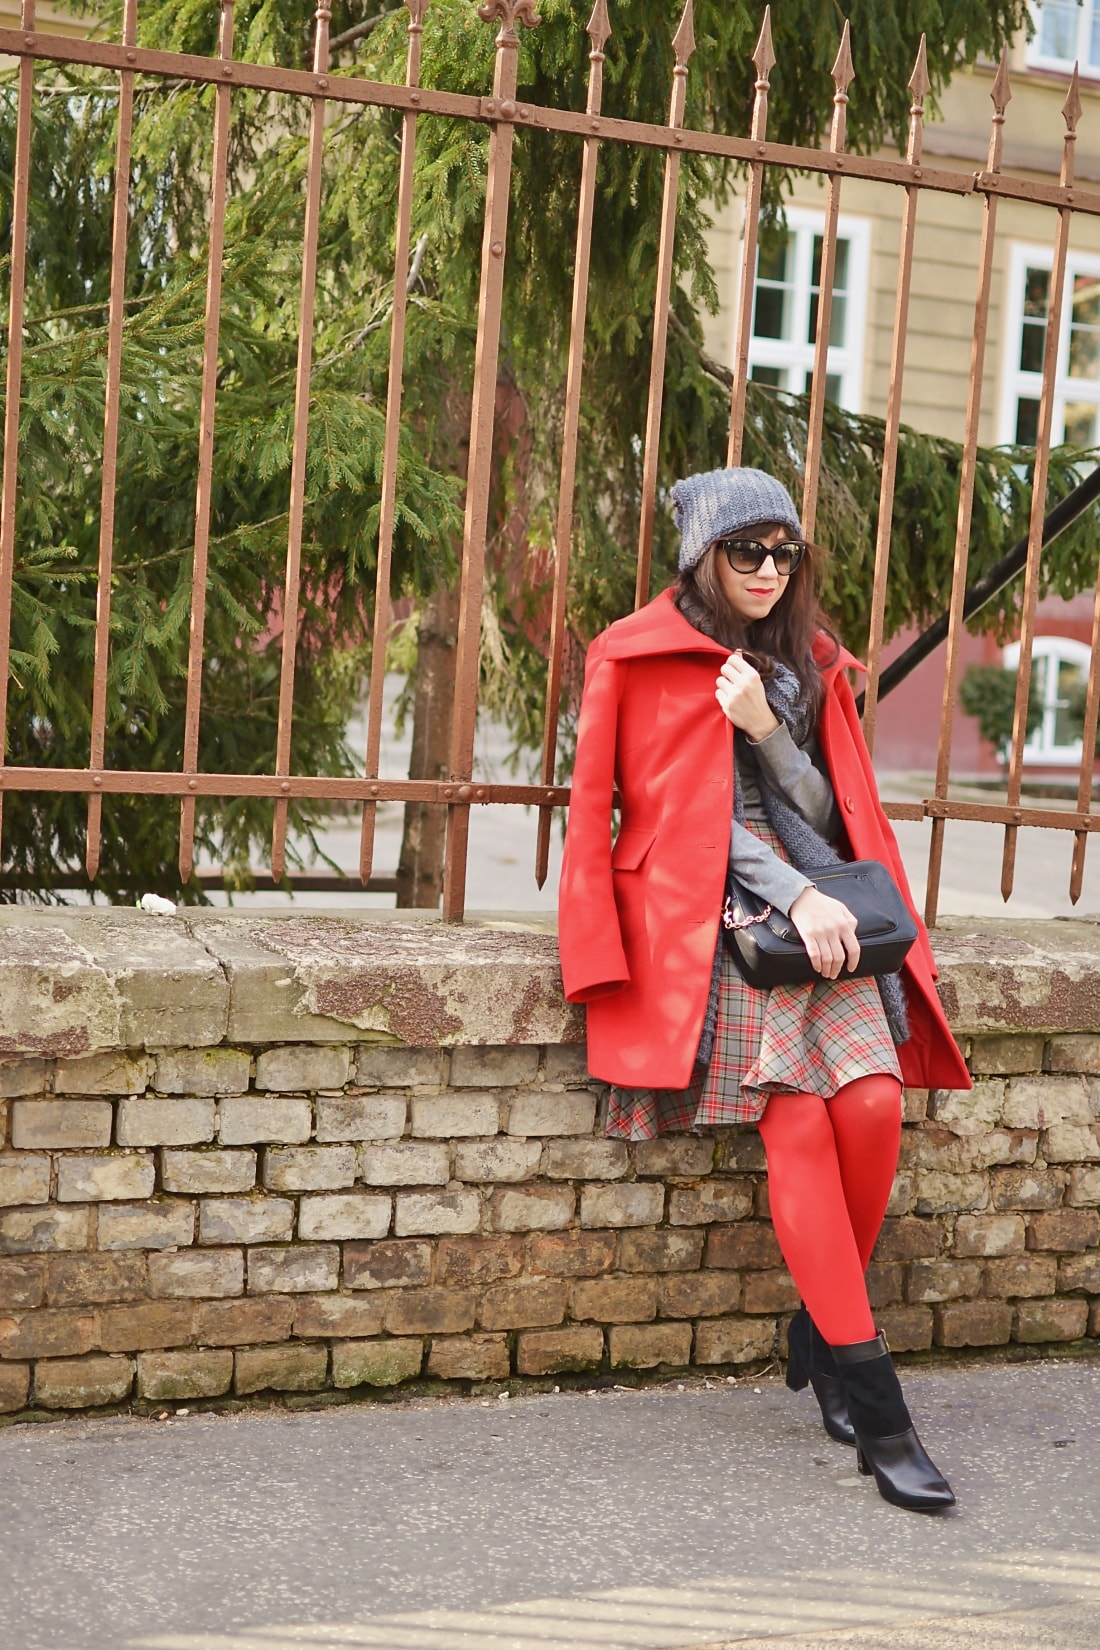 Červená_Katharine-fashion is beautiful_blog 7_Červené pančuchy_Červený kabát_Károvaná sukňa_Katarína Jakubčová_Fashion blogger_Outfit